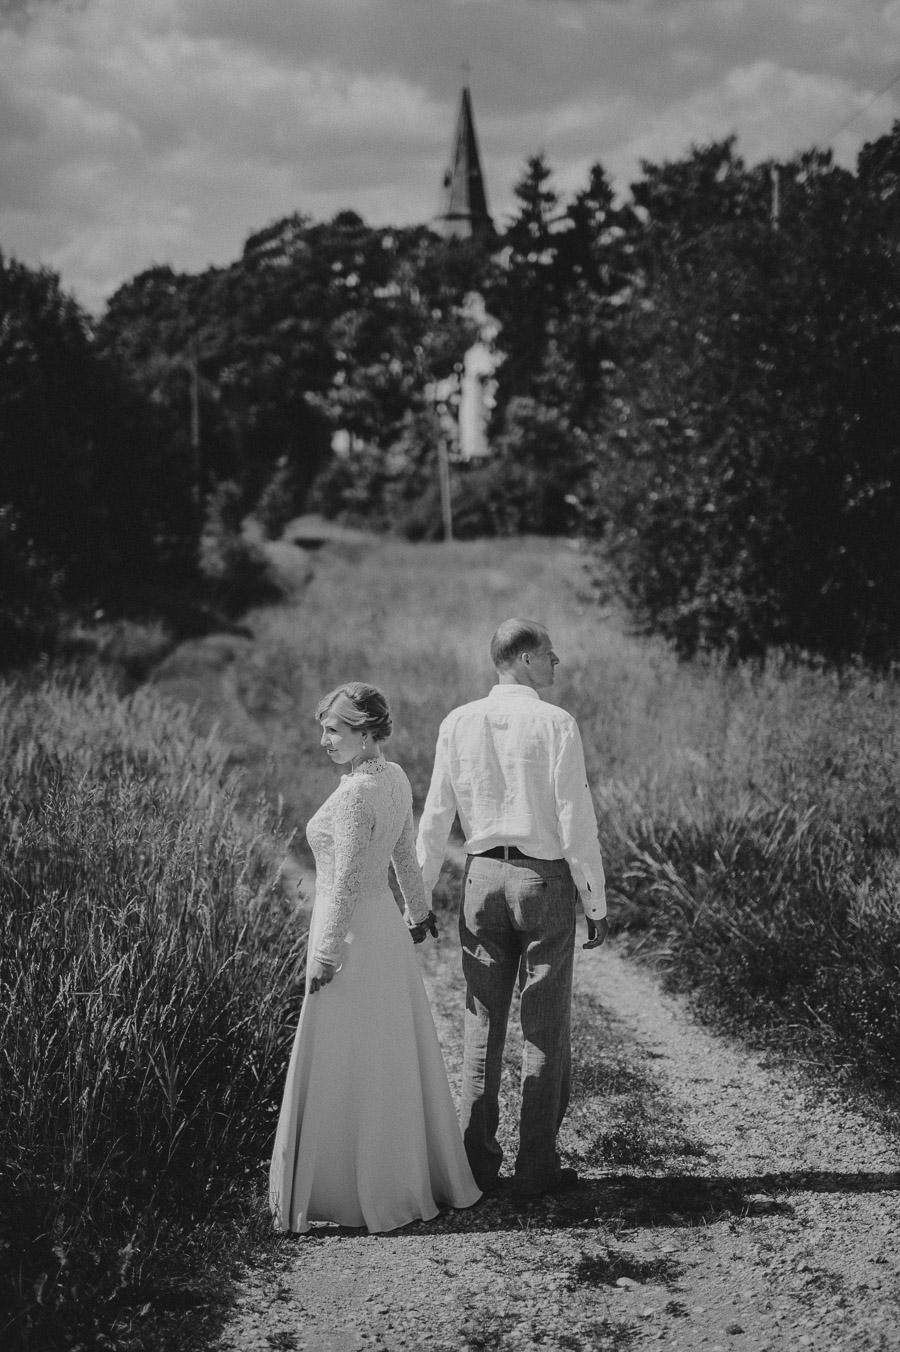 Best_wedding_photos_moments_2014_mait_juriado_M&J-Studios-075